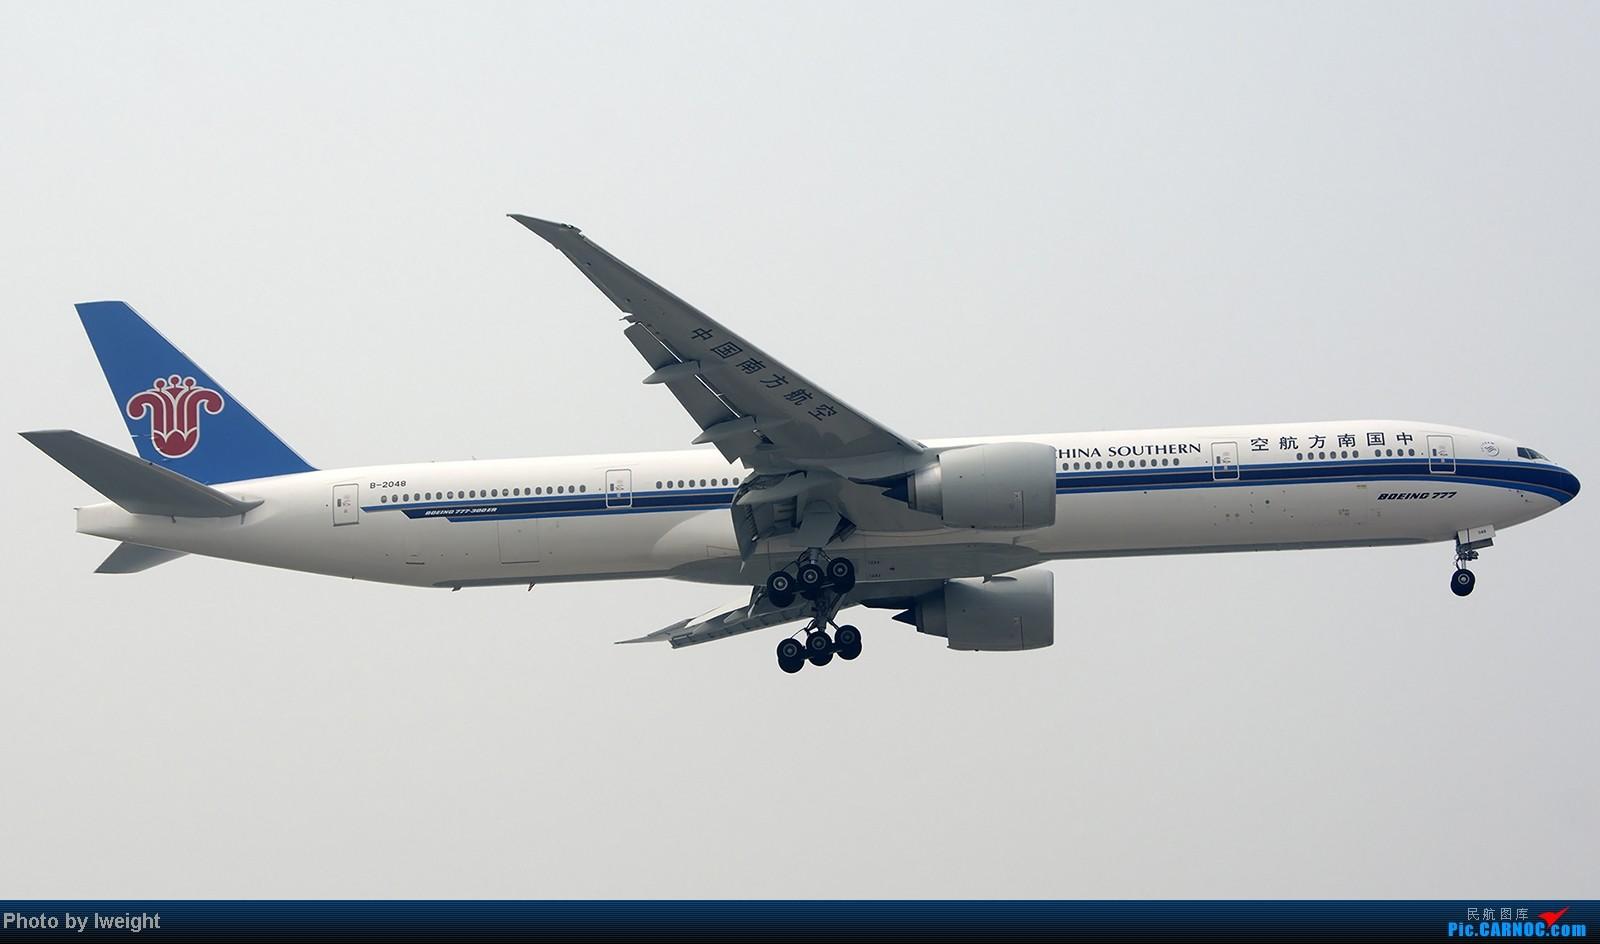 Re:[原创]9月7日帝都的烂天里乱拍一通 BOEING 777-300ER B-2048 中国北京首都机场